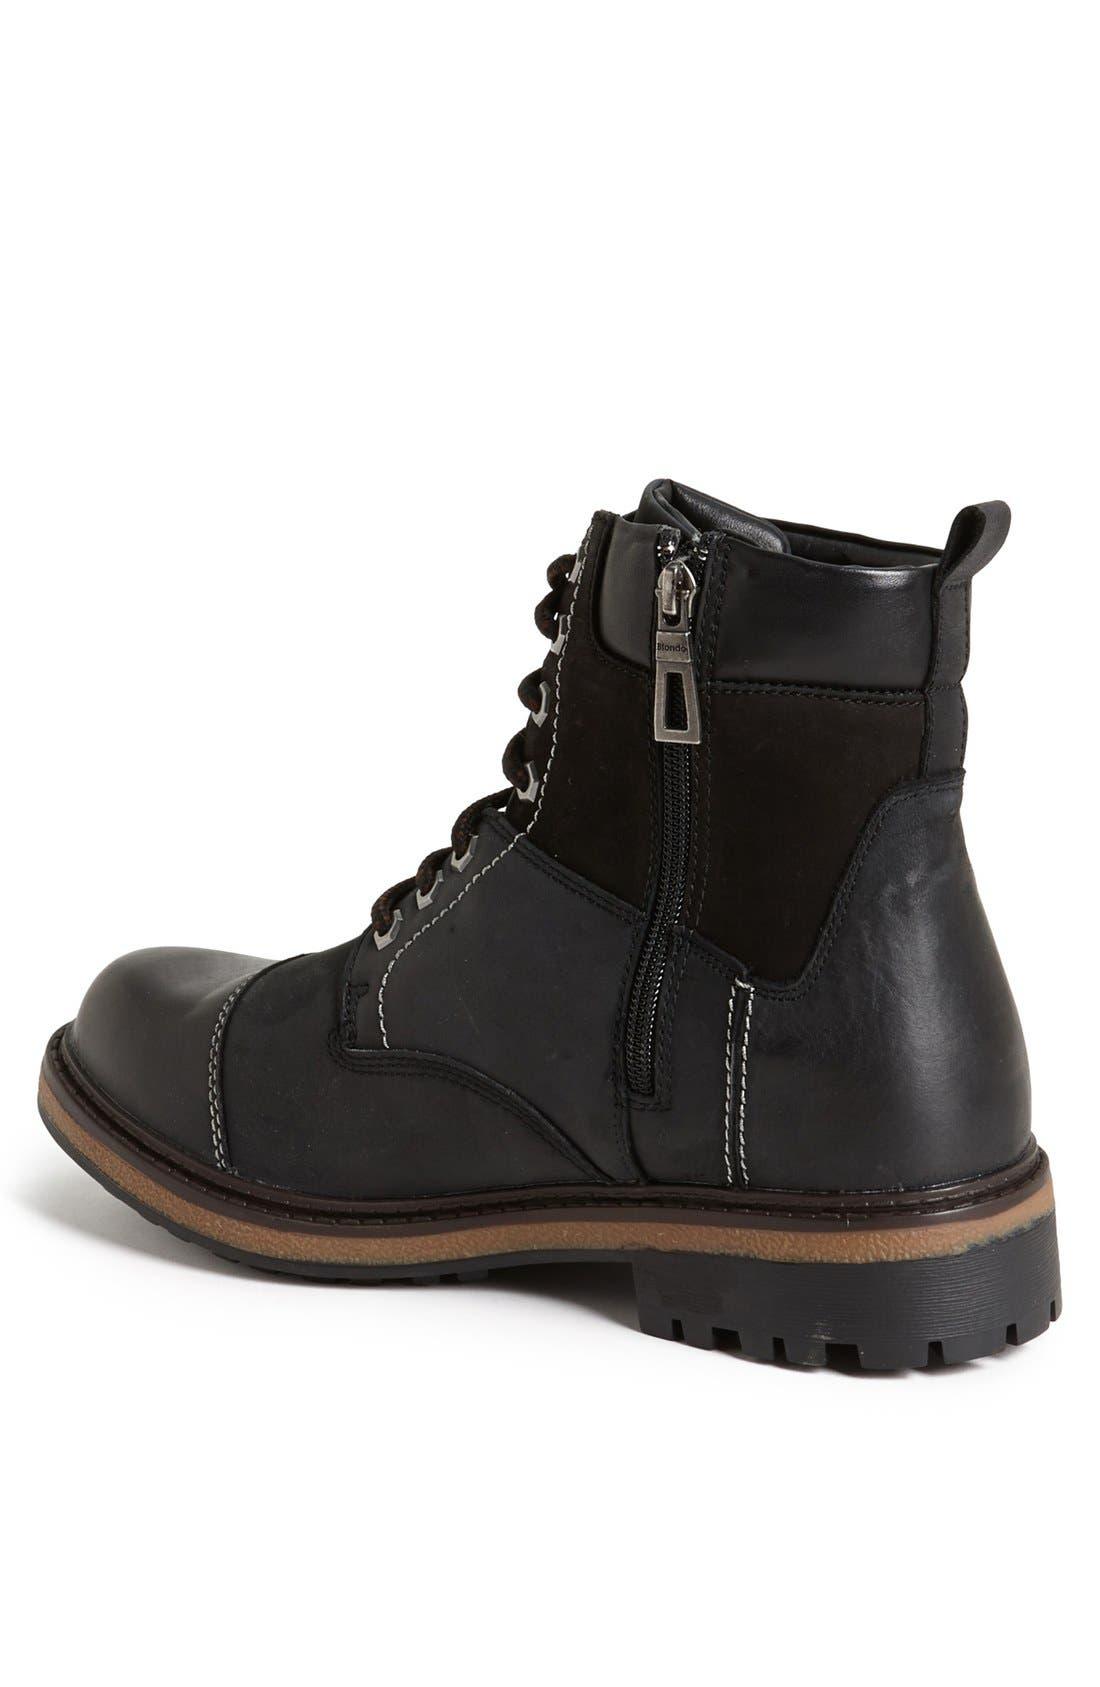 'Jaro' Waterproof Boot,                             Alternate thumbnail 2, color,                             Black